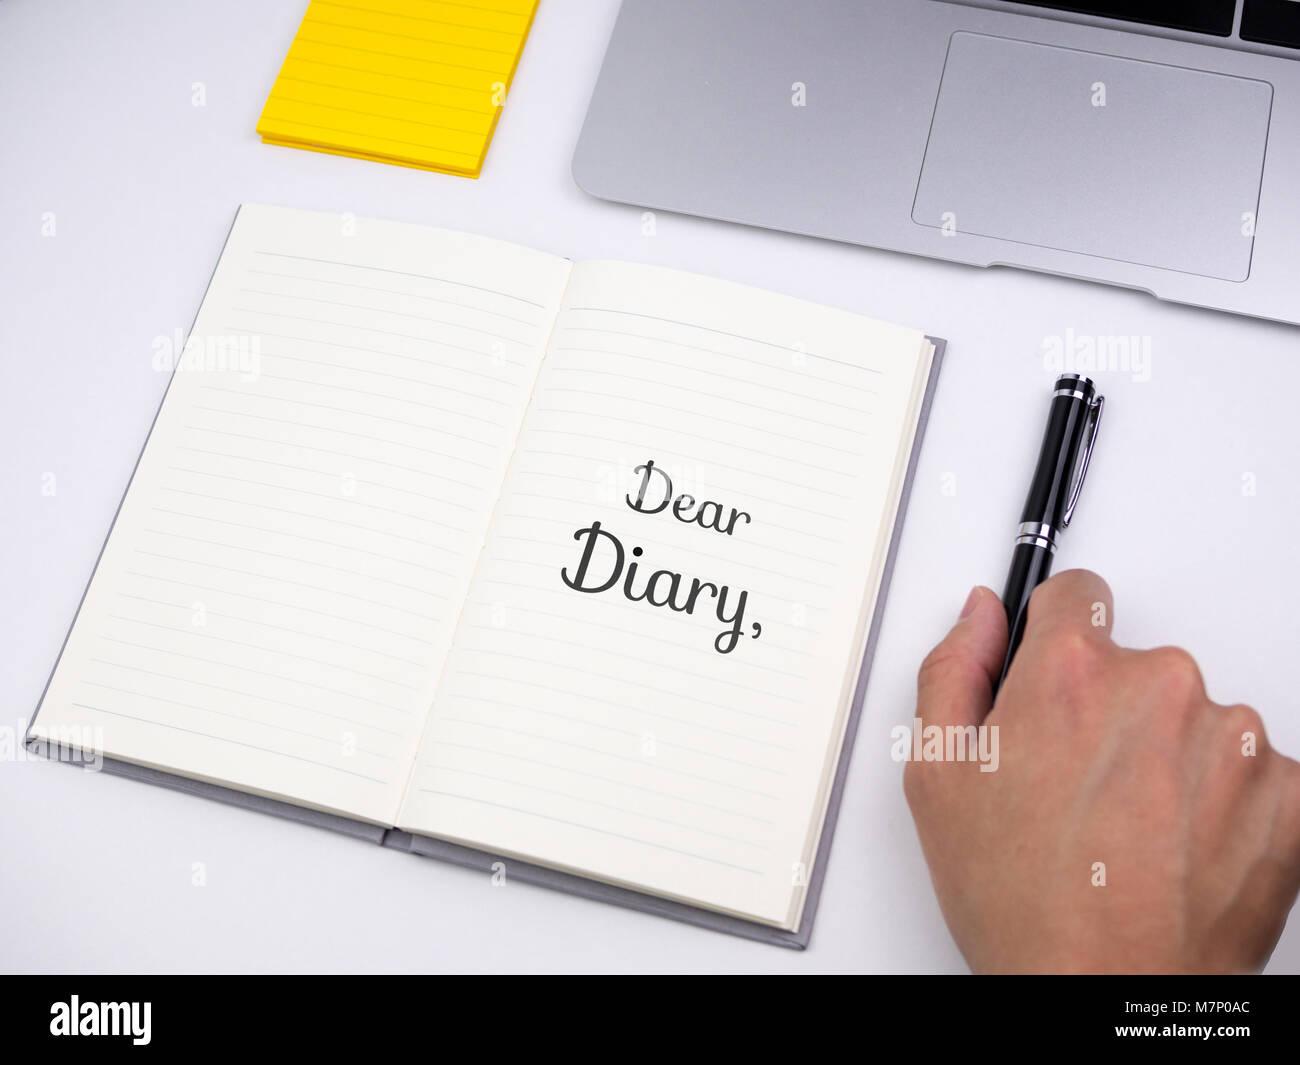 Dear diary written on notebook - Stock Image